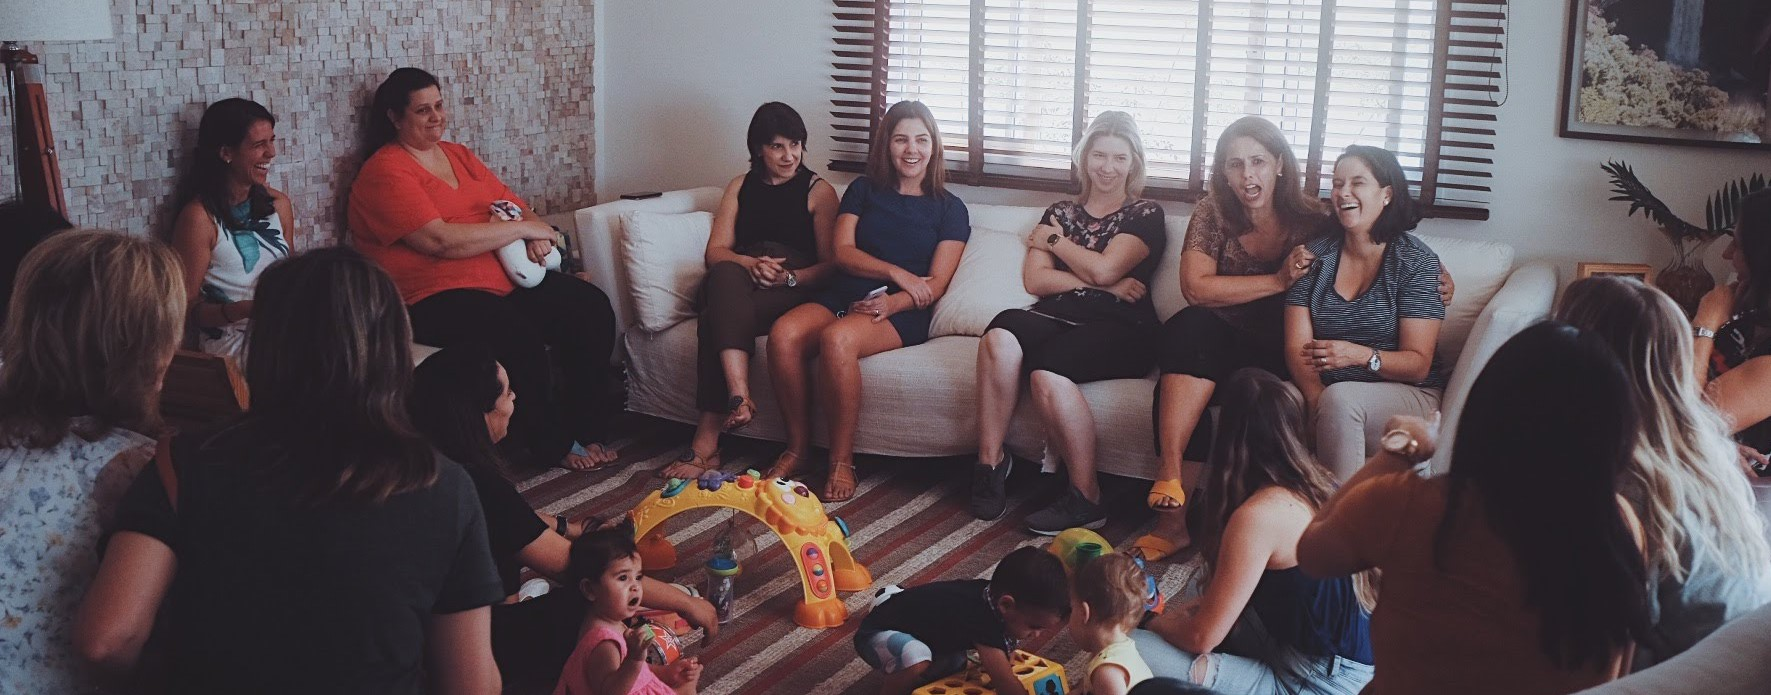 Mops Group in Brazil